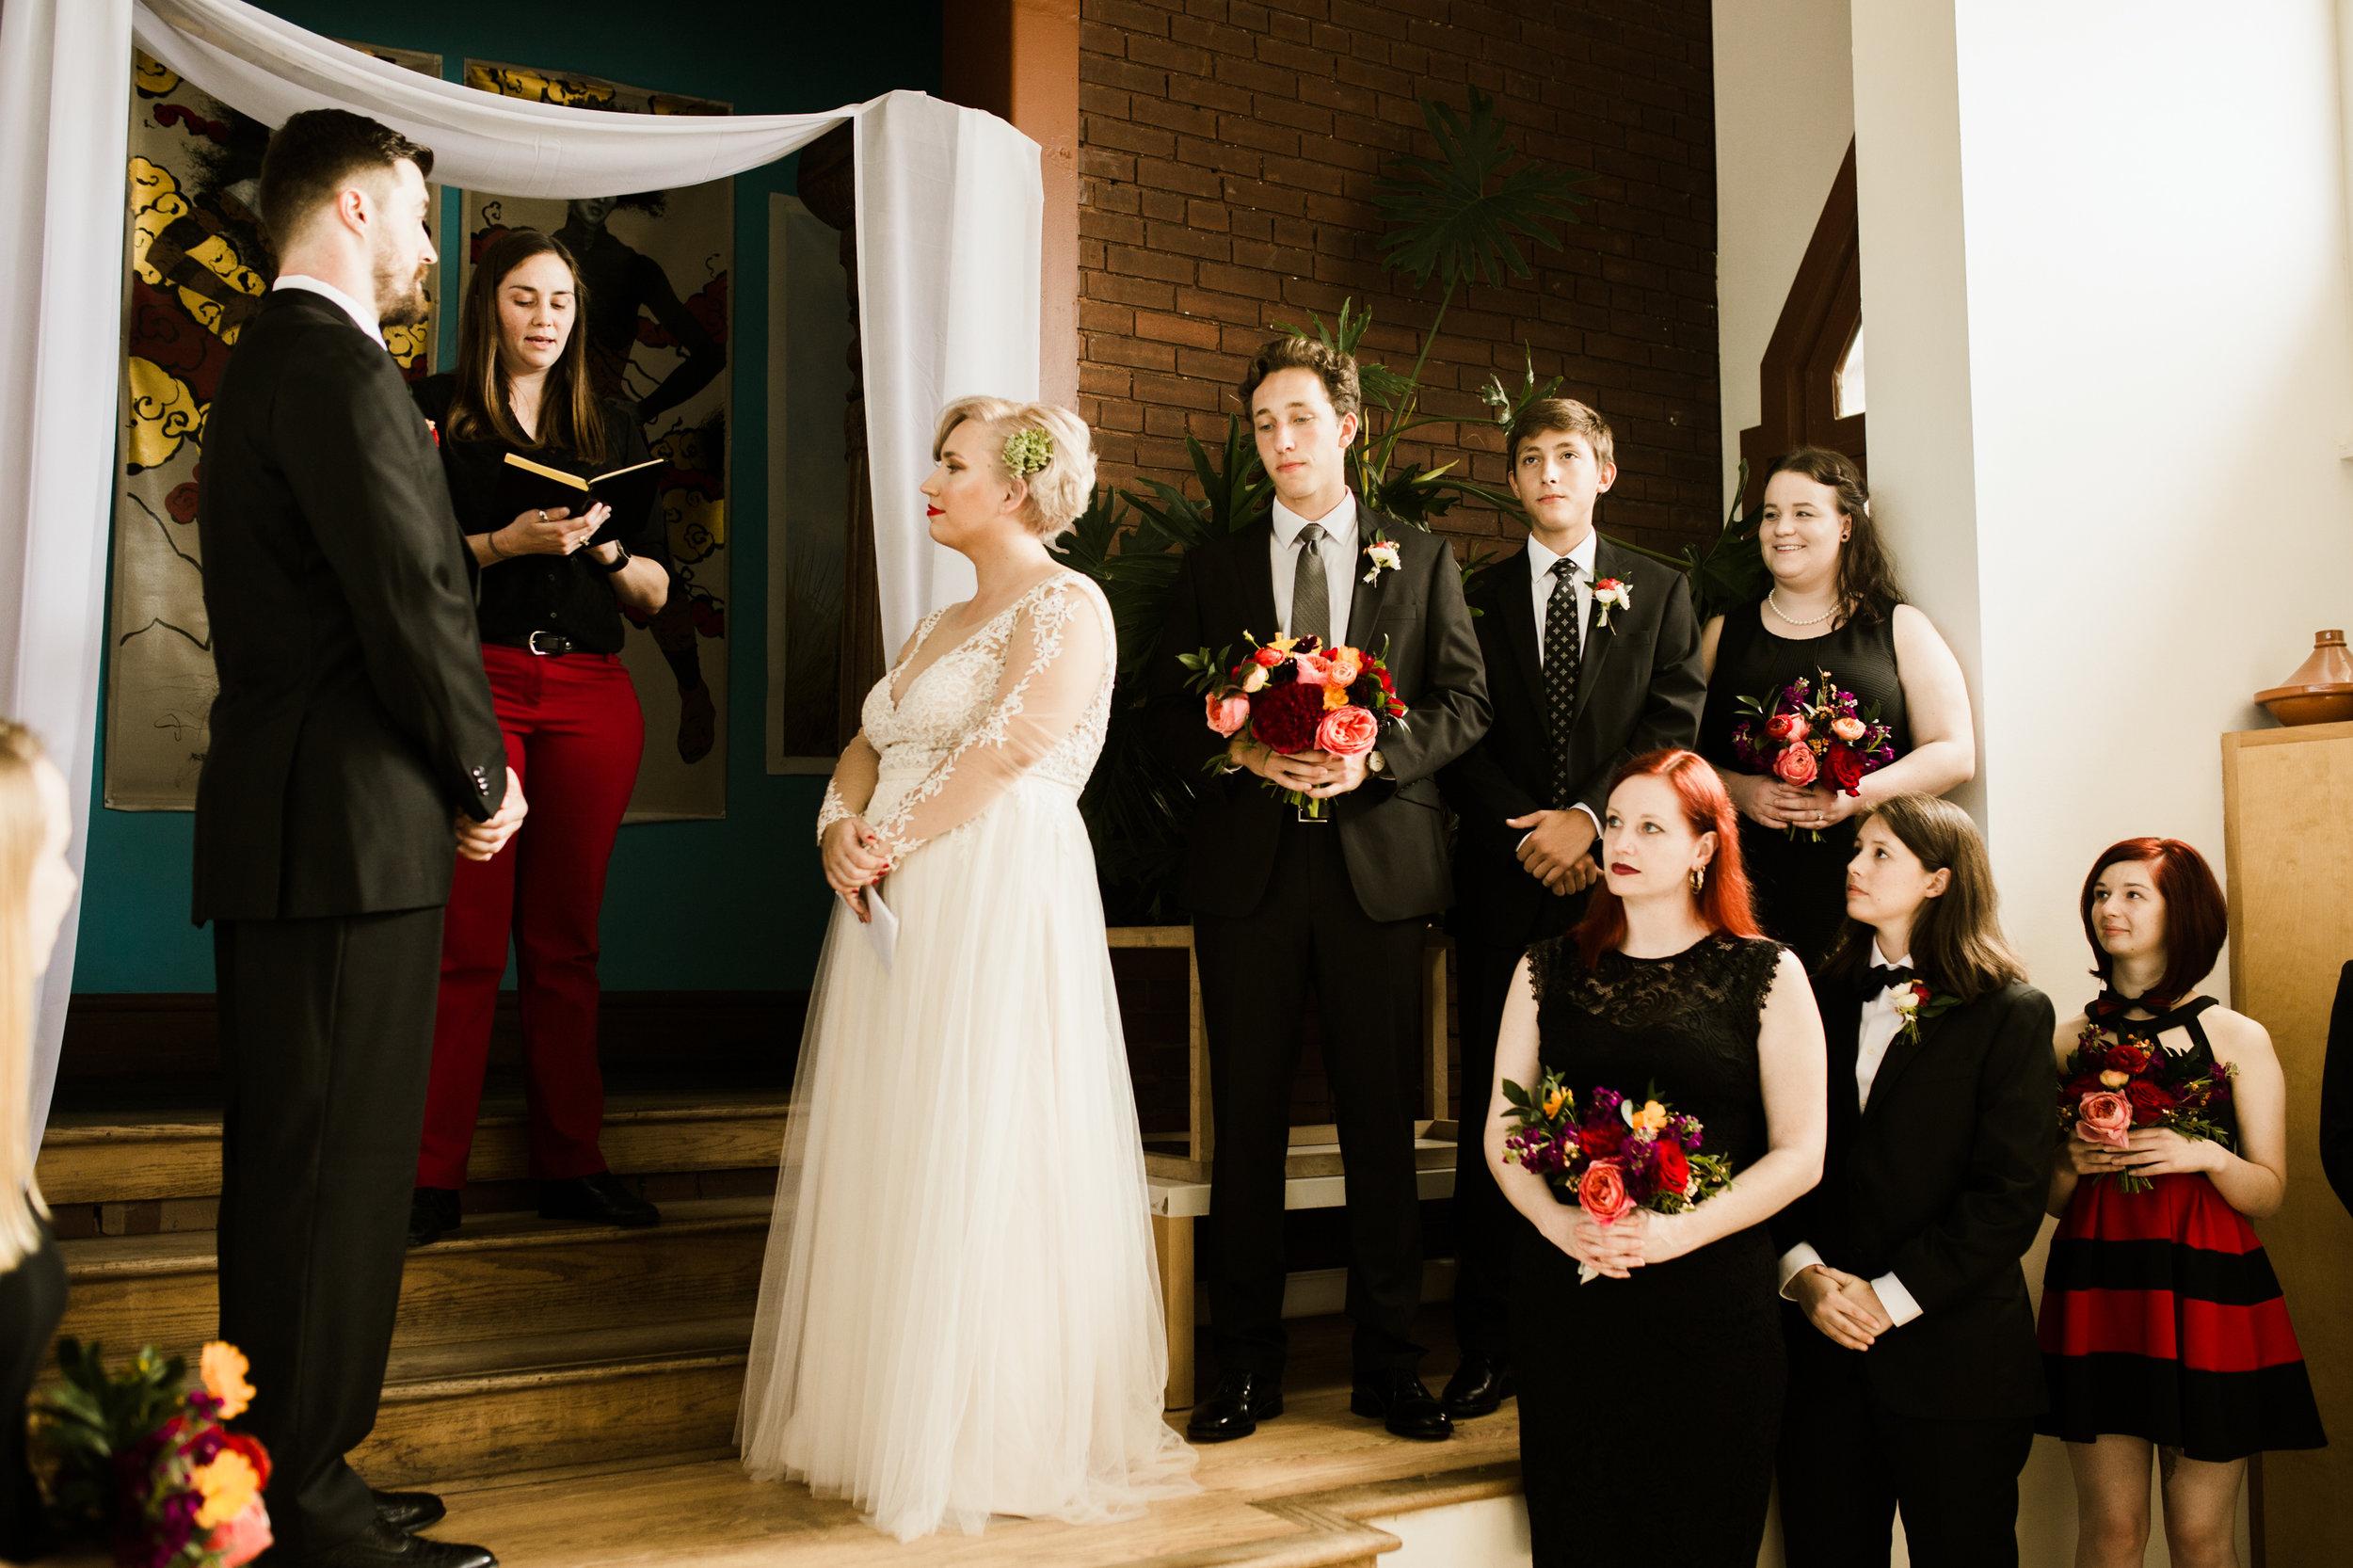 Kentucky Wedding Louisville Wedding Photographer 2018 Crystal Ludwick Photo Louisville Wedding Photographer Kentucky Wedding Photographer (31 of 105).jpg